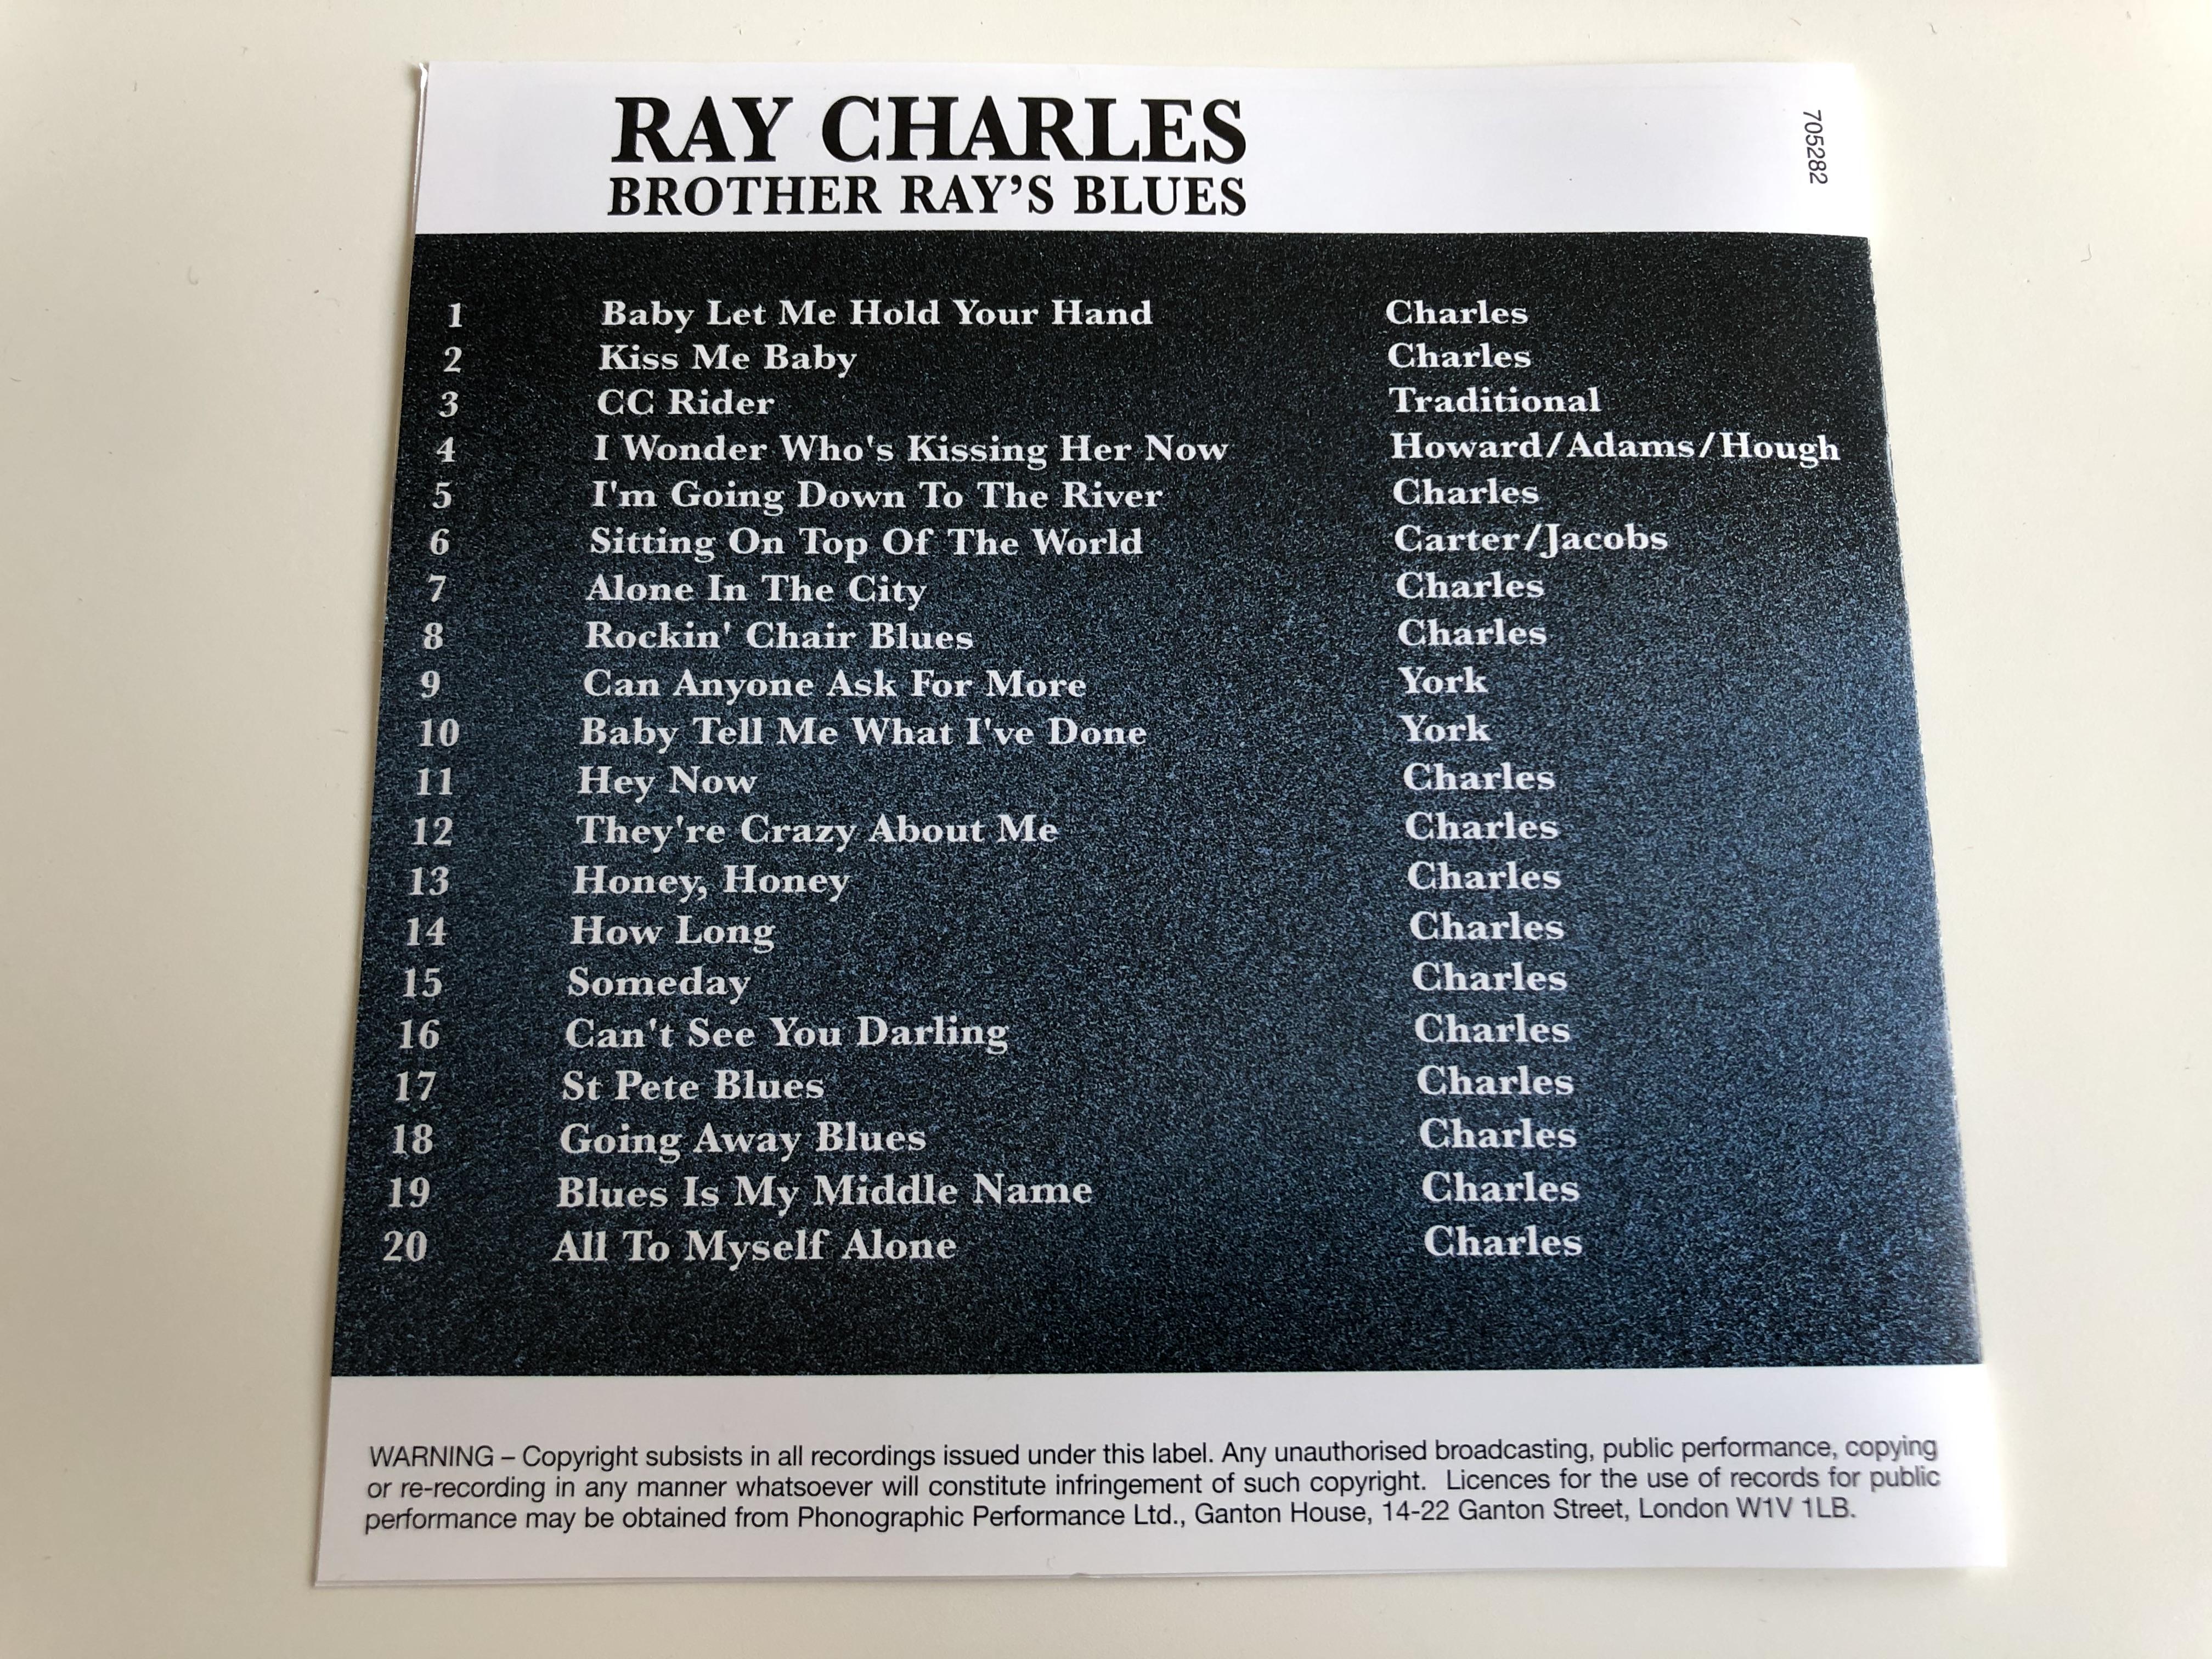 ray-charles-brothes-ray-s-bluesimg-3952.jpg